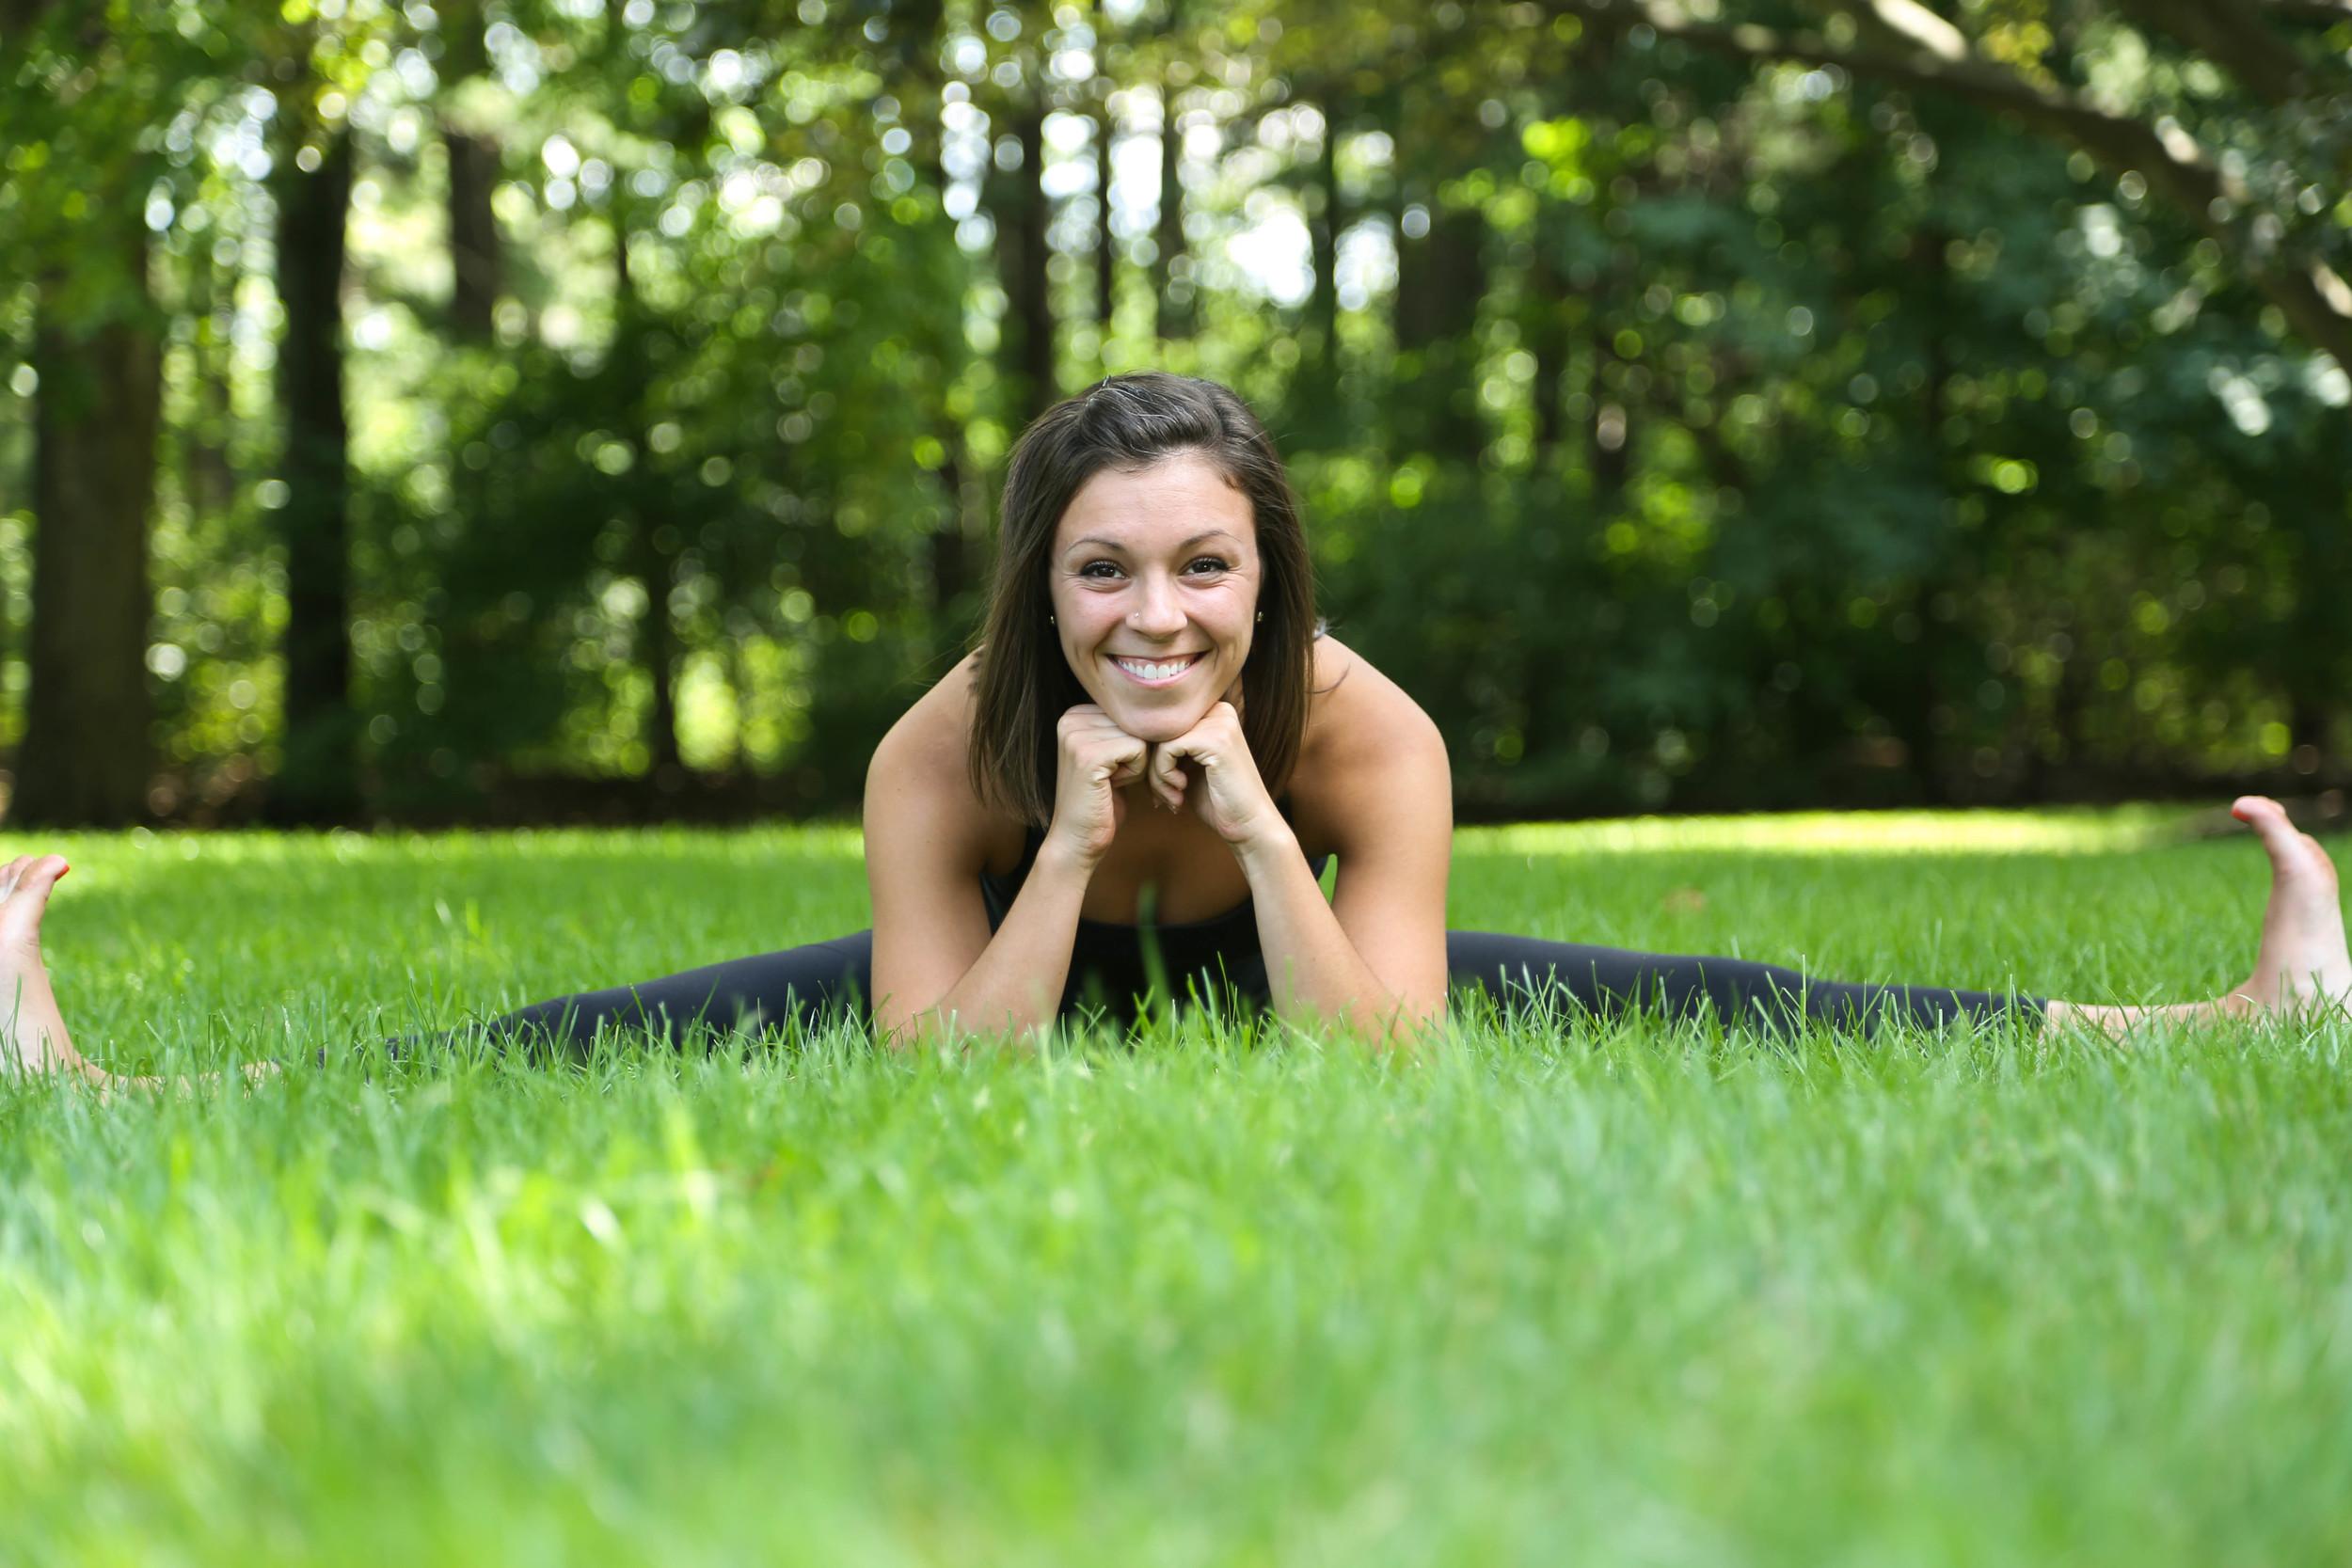 Tracy_Rodriguez_Photography_Yoga_Portfolio_Radiant_Yoga_Boston_TeacherTraining-4006.jpg